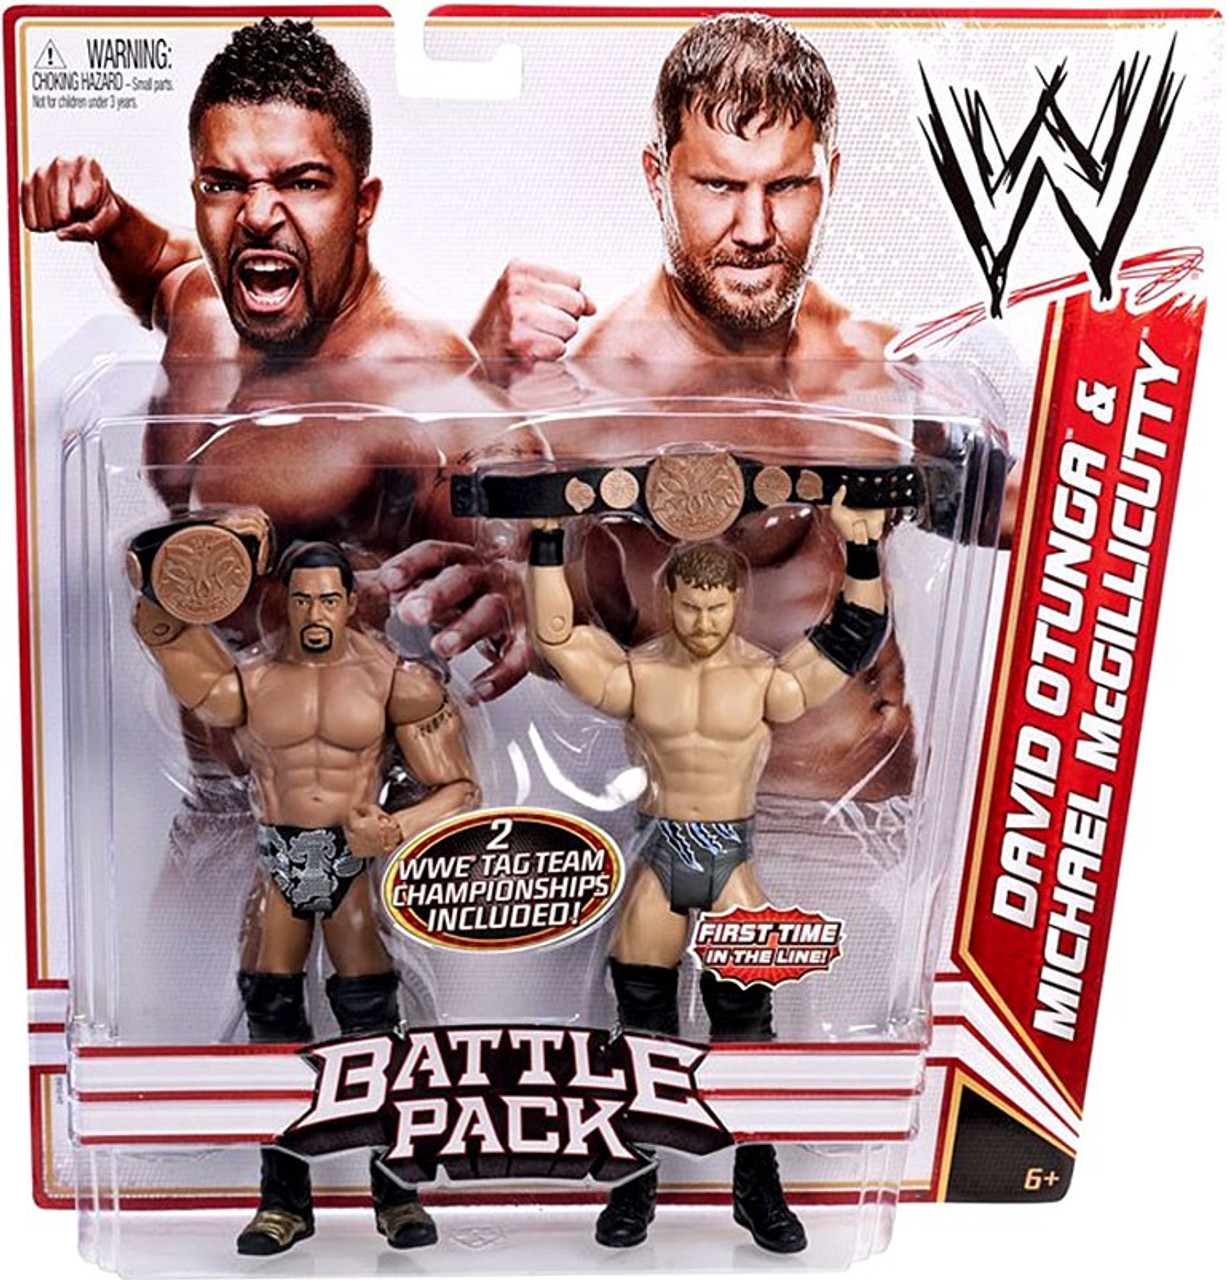 WWE Wrestling Series 16 David Otunga & Michael McGillicutty (Curtis Axel) Action Figure 2-Pack [2 WWE Tag Team Championships]